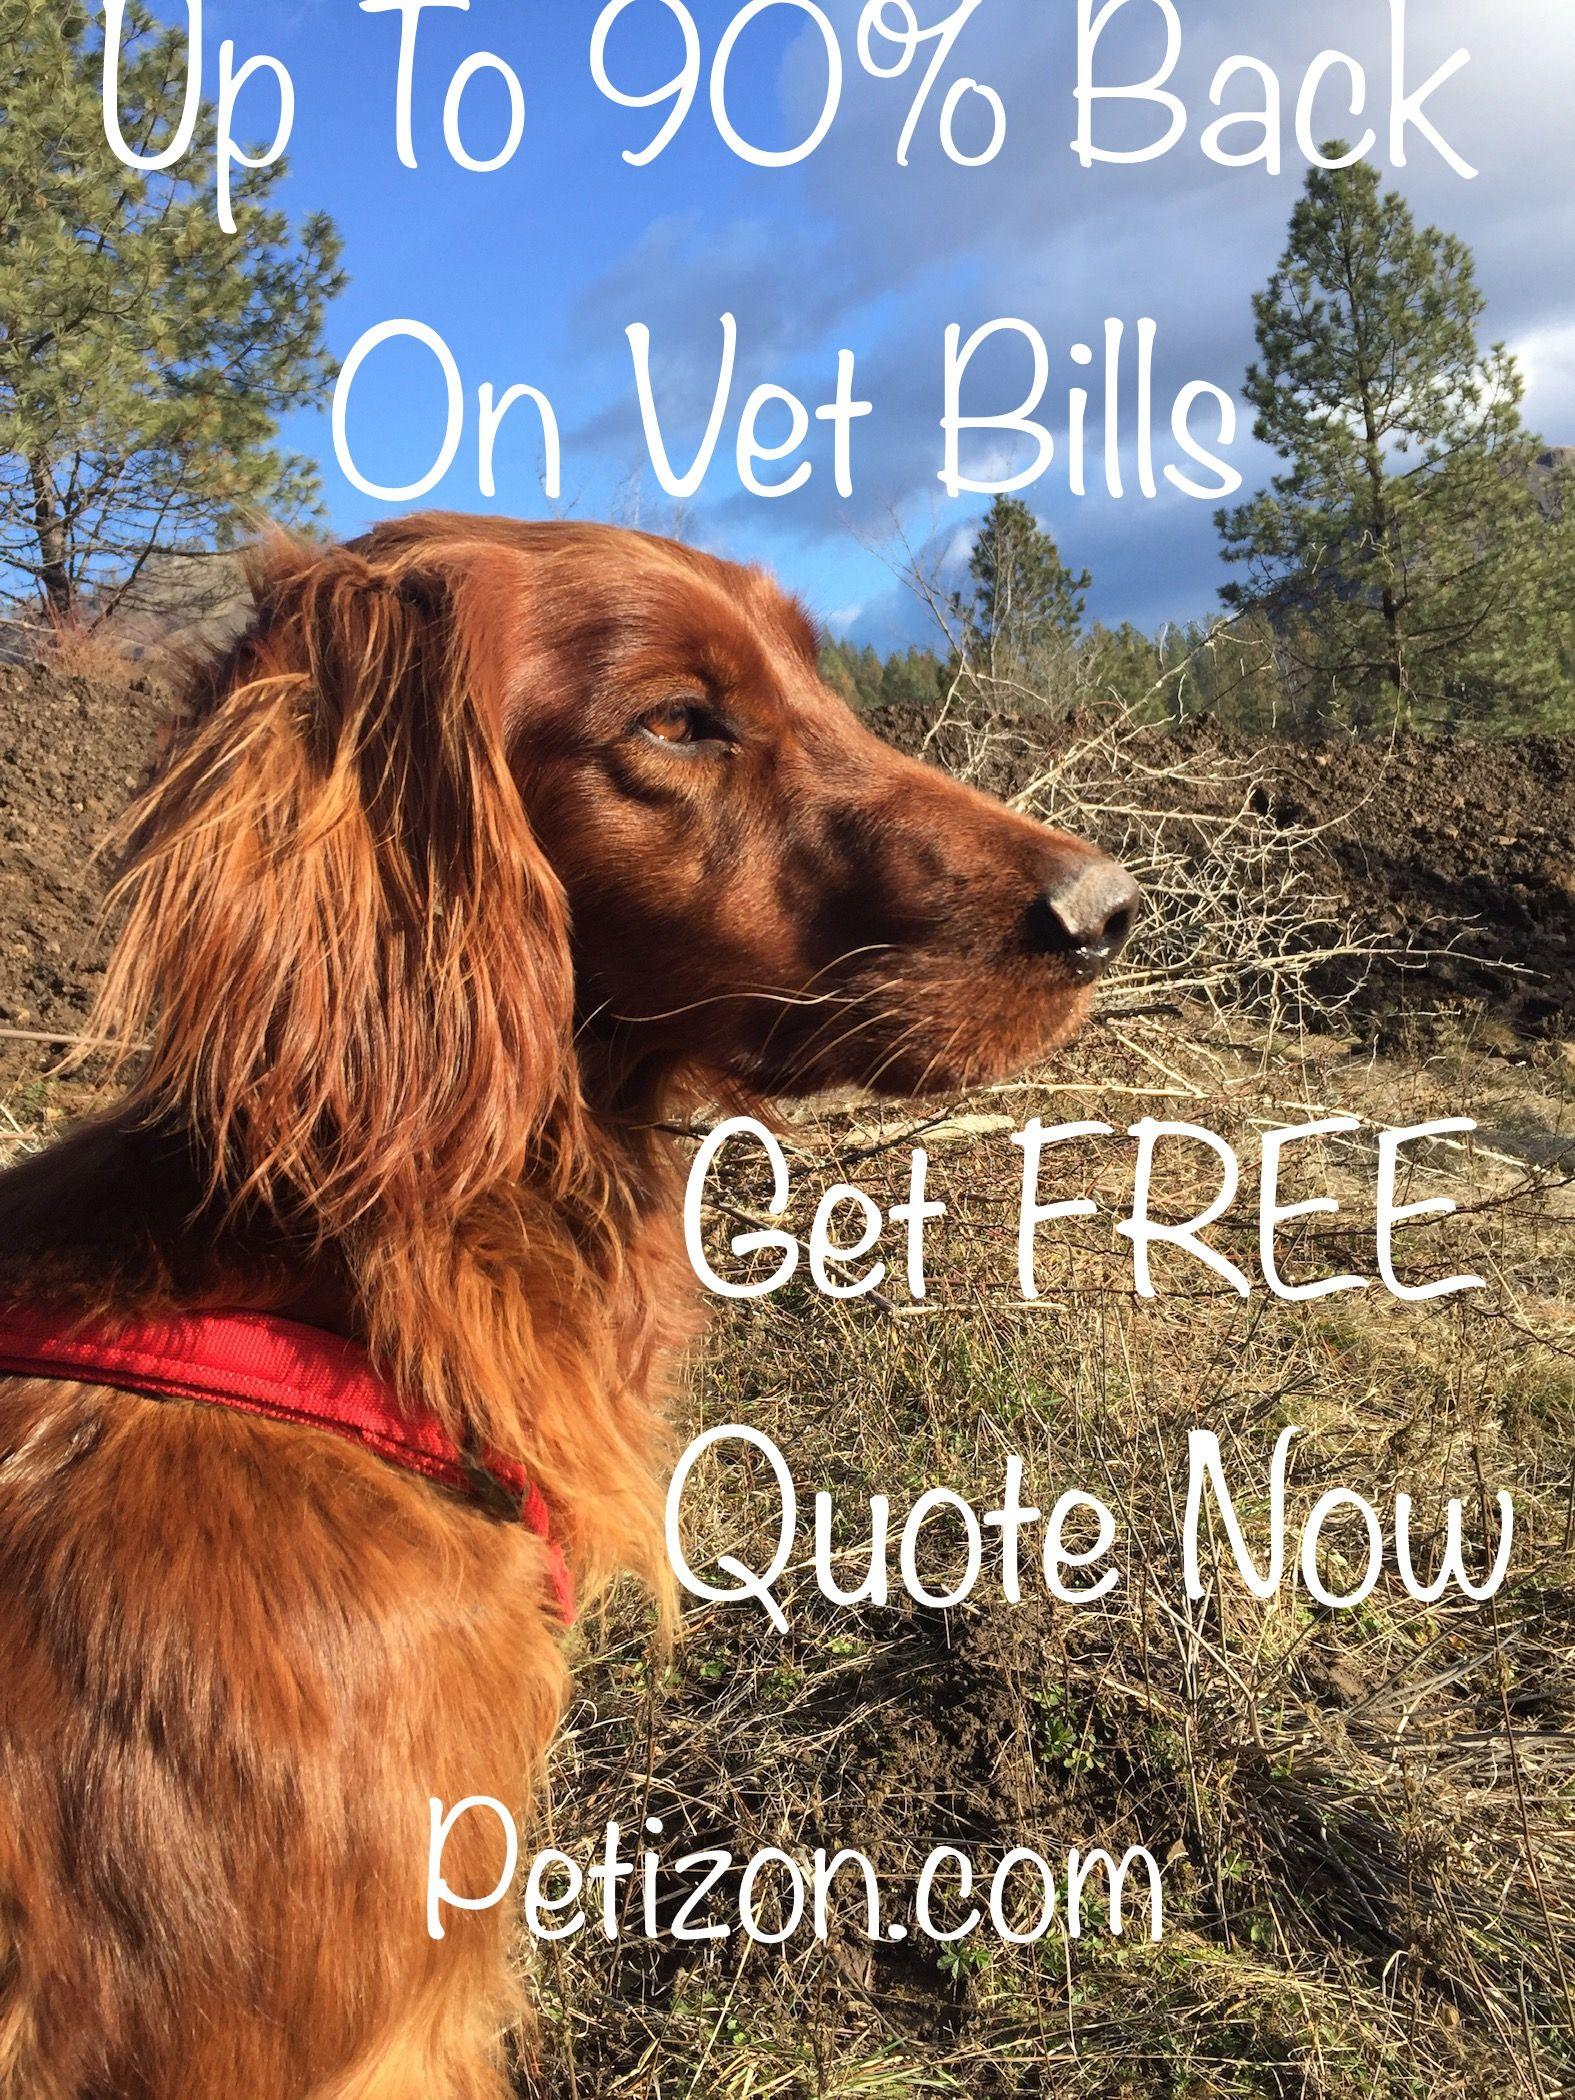 Pet Care Pets Pet Insurance in 2020 Vet bills